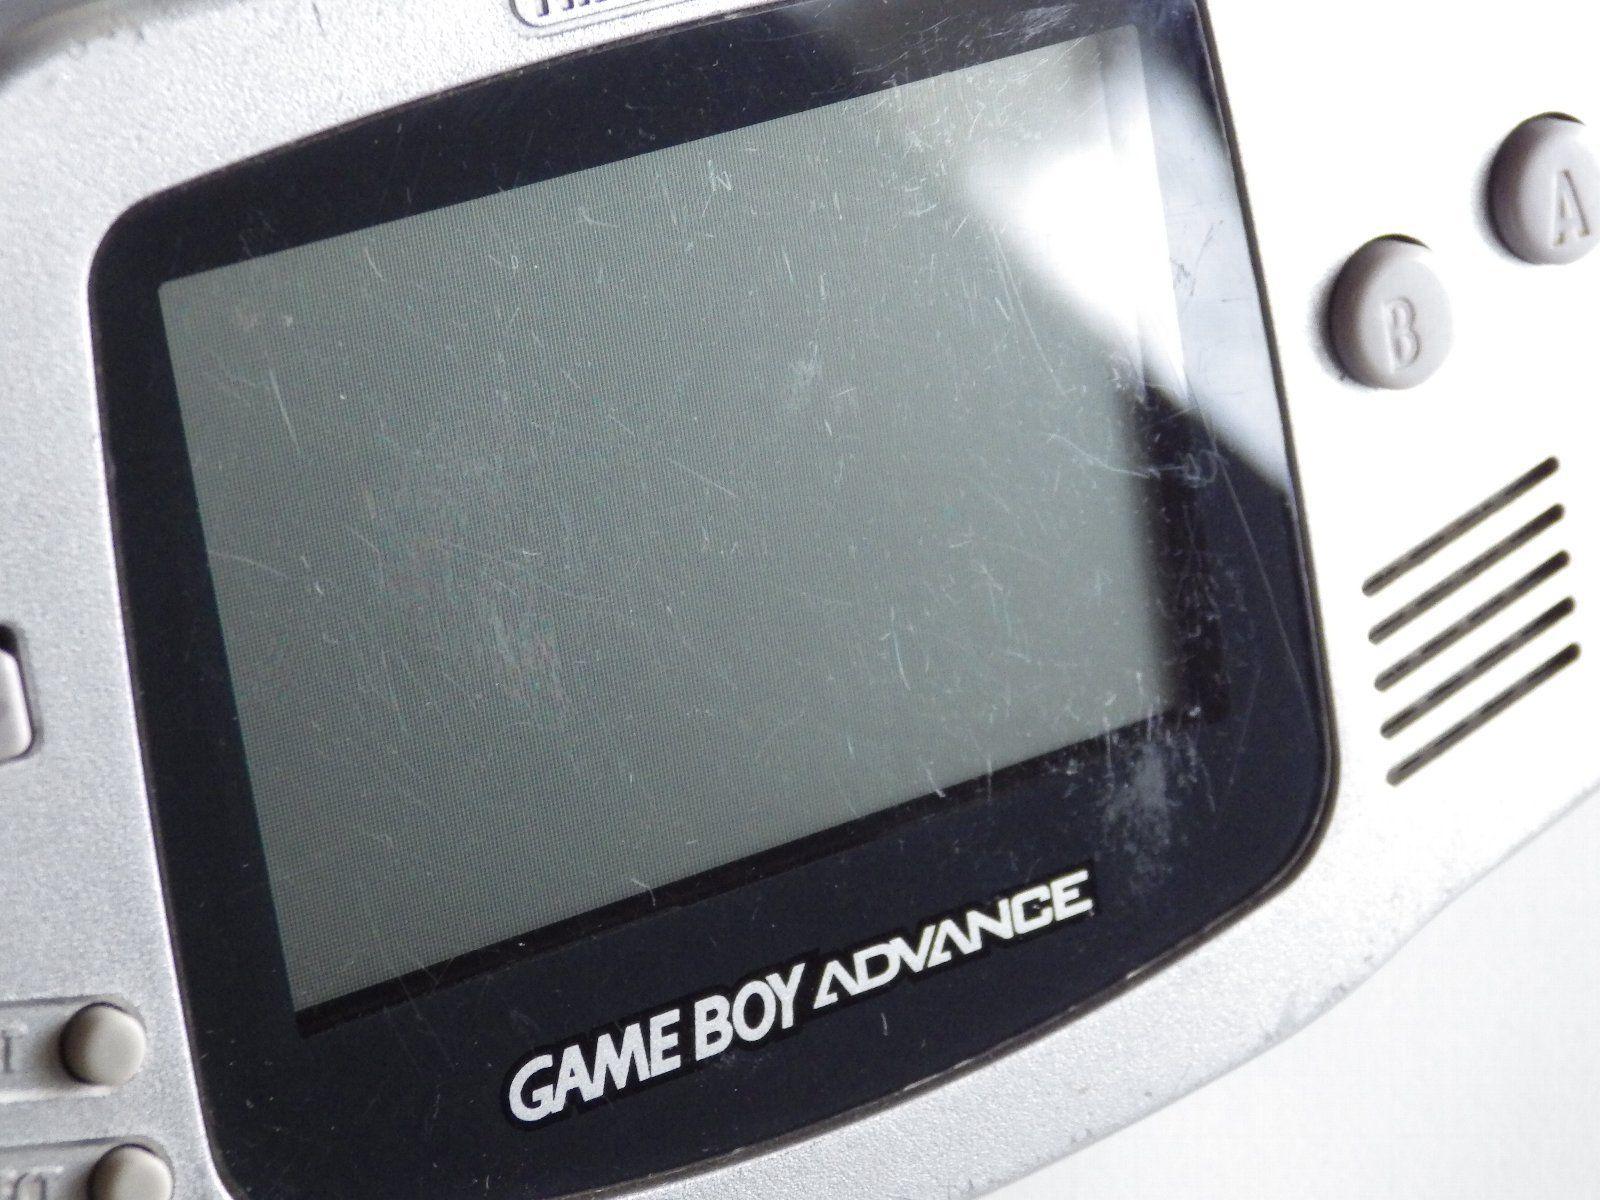 Gameboy Advance, Hopea